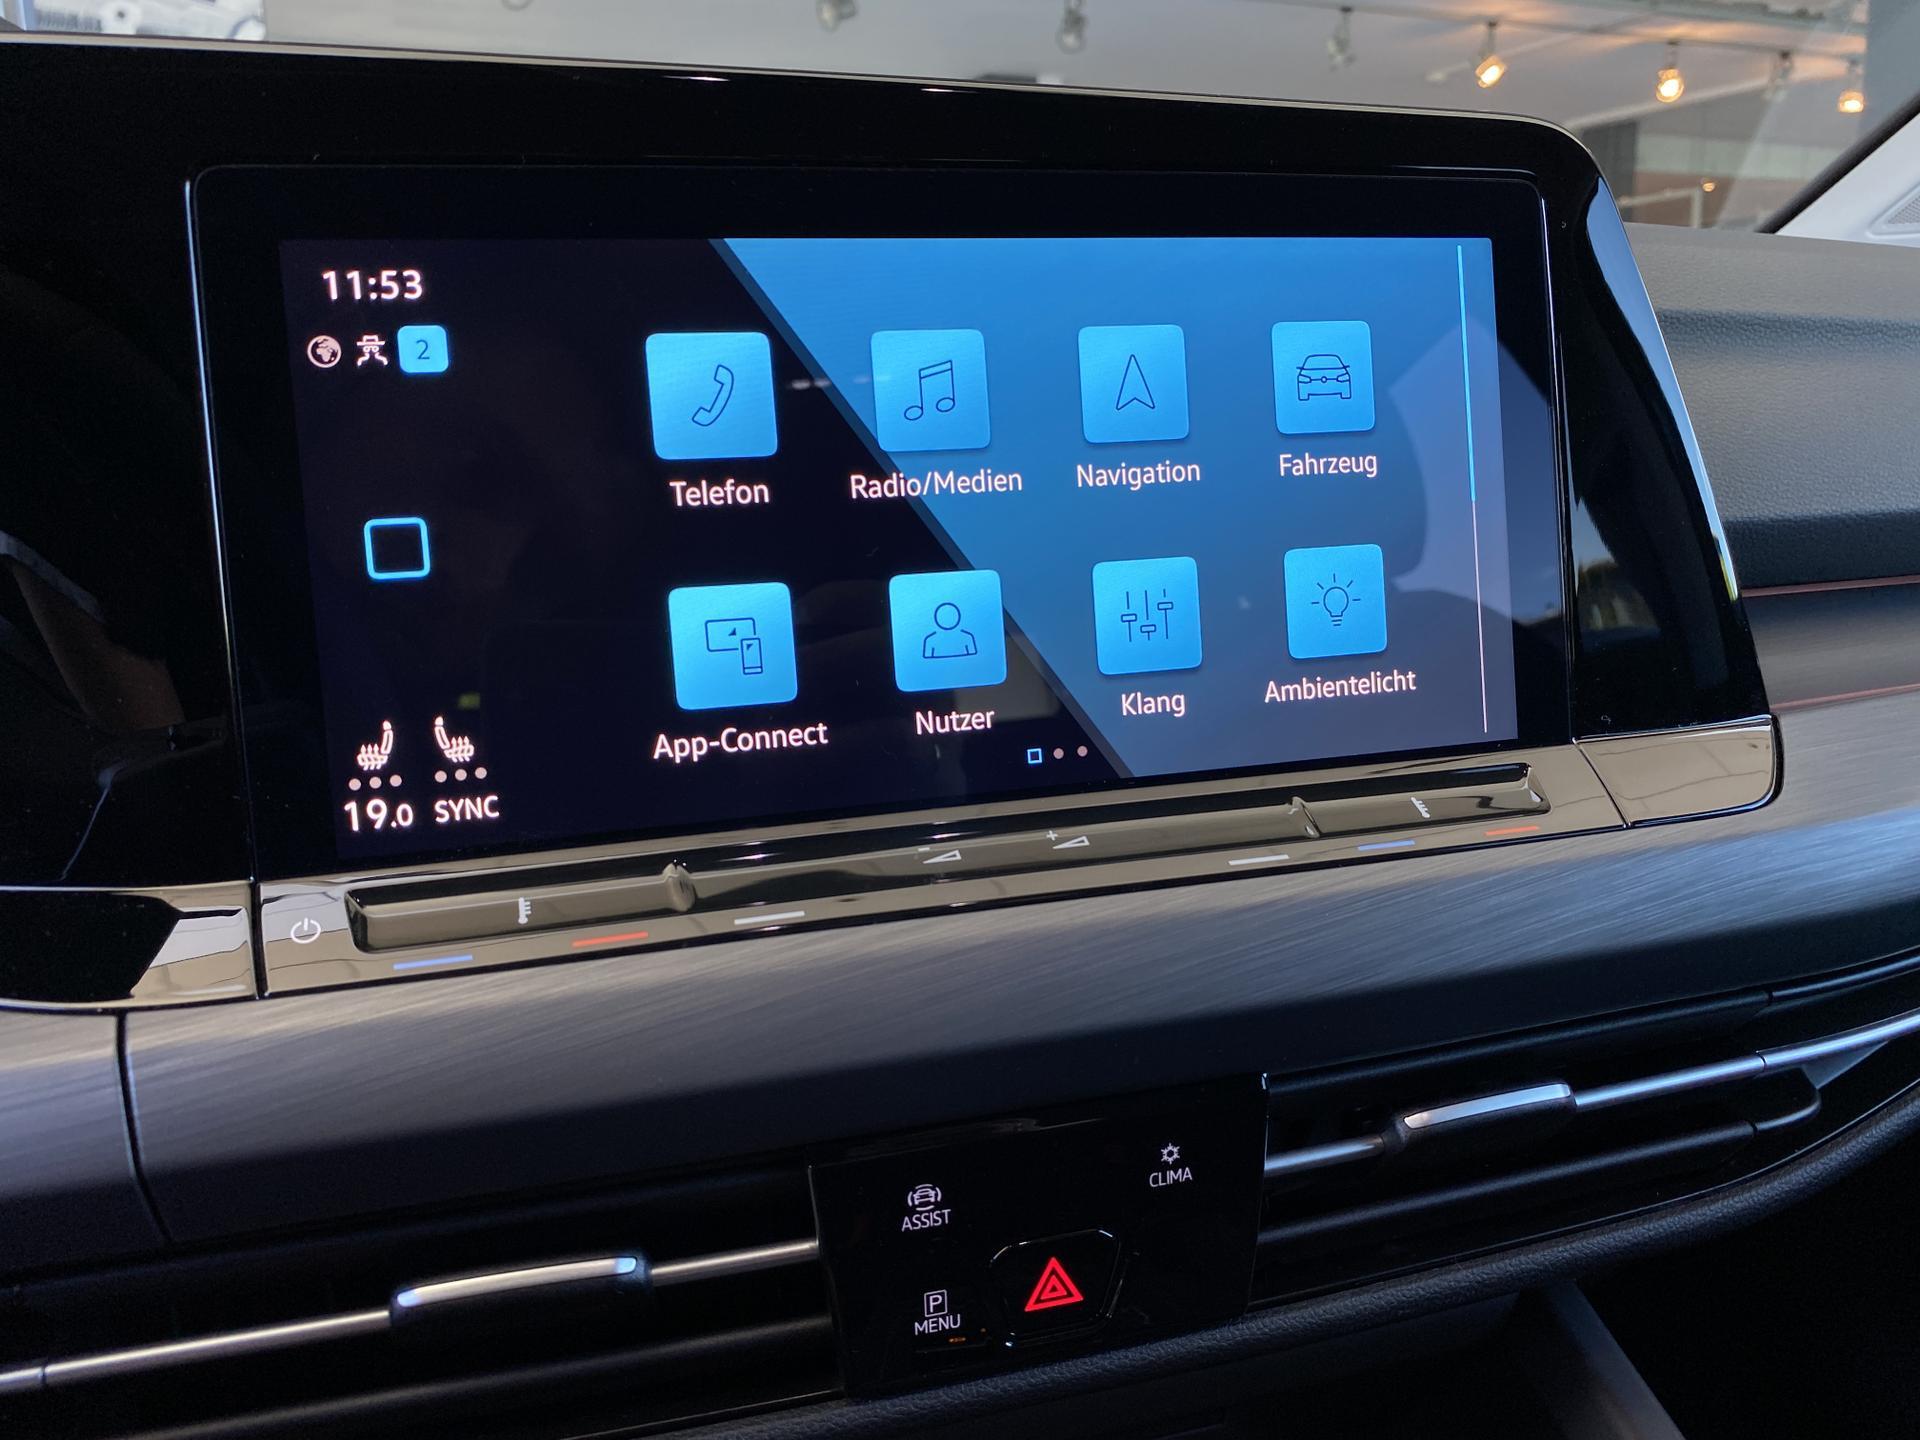 VW Golf Variant Multimedia